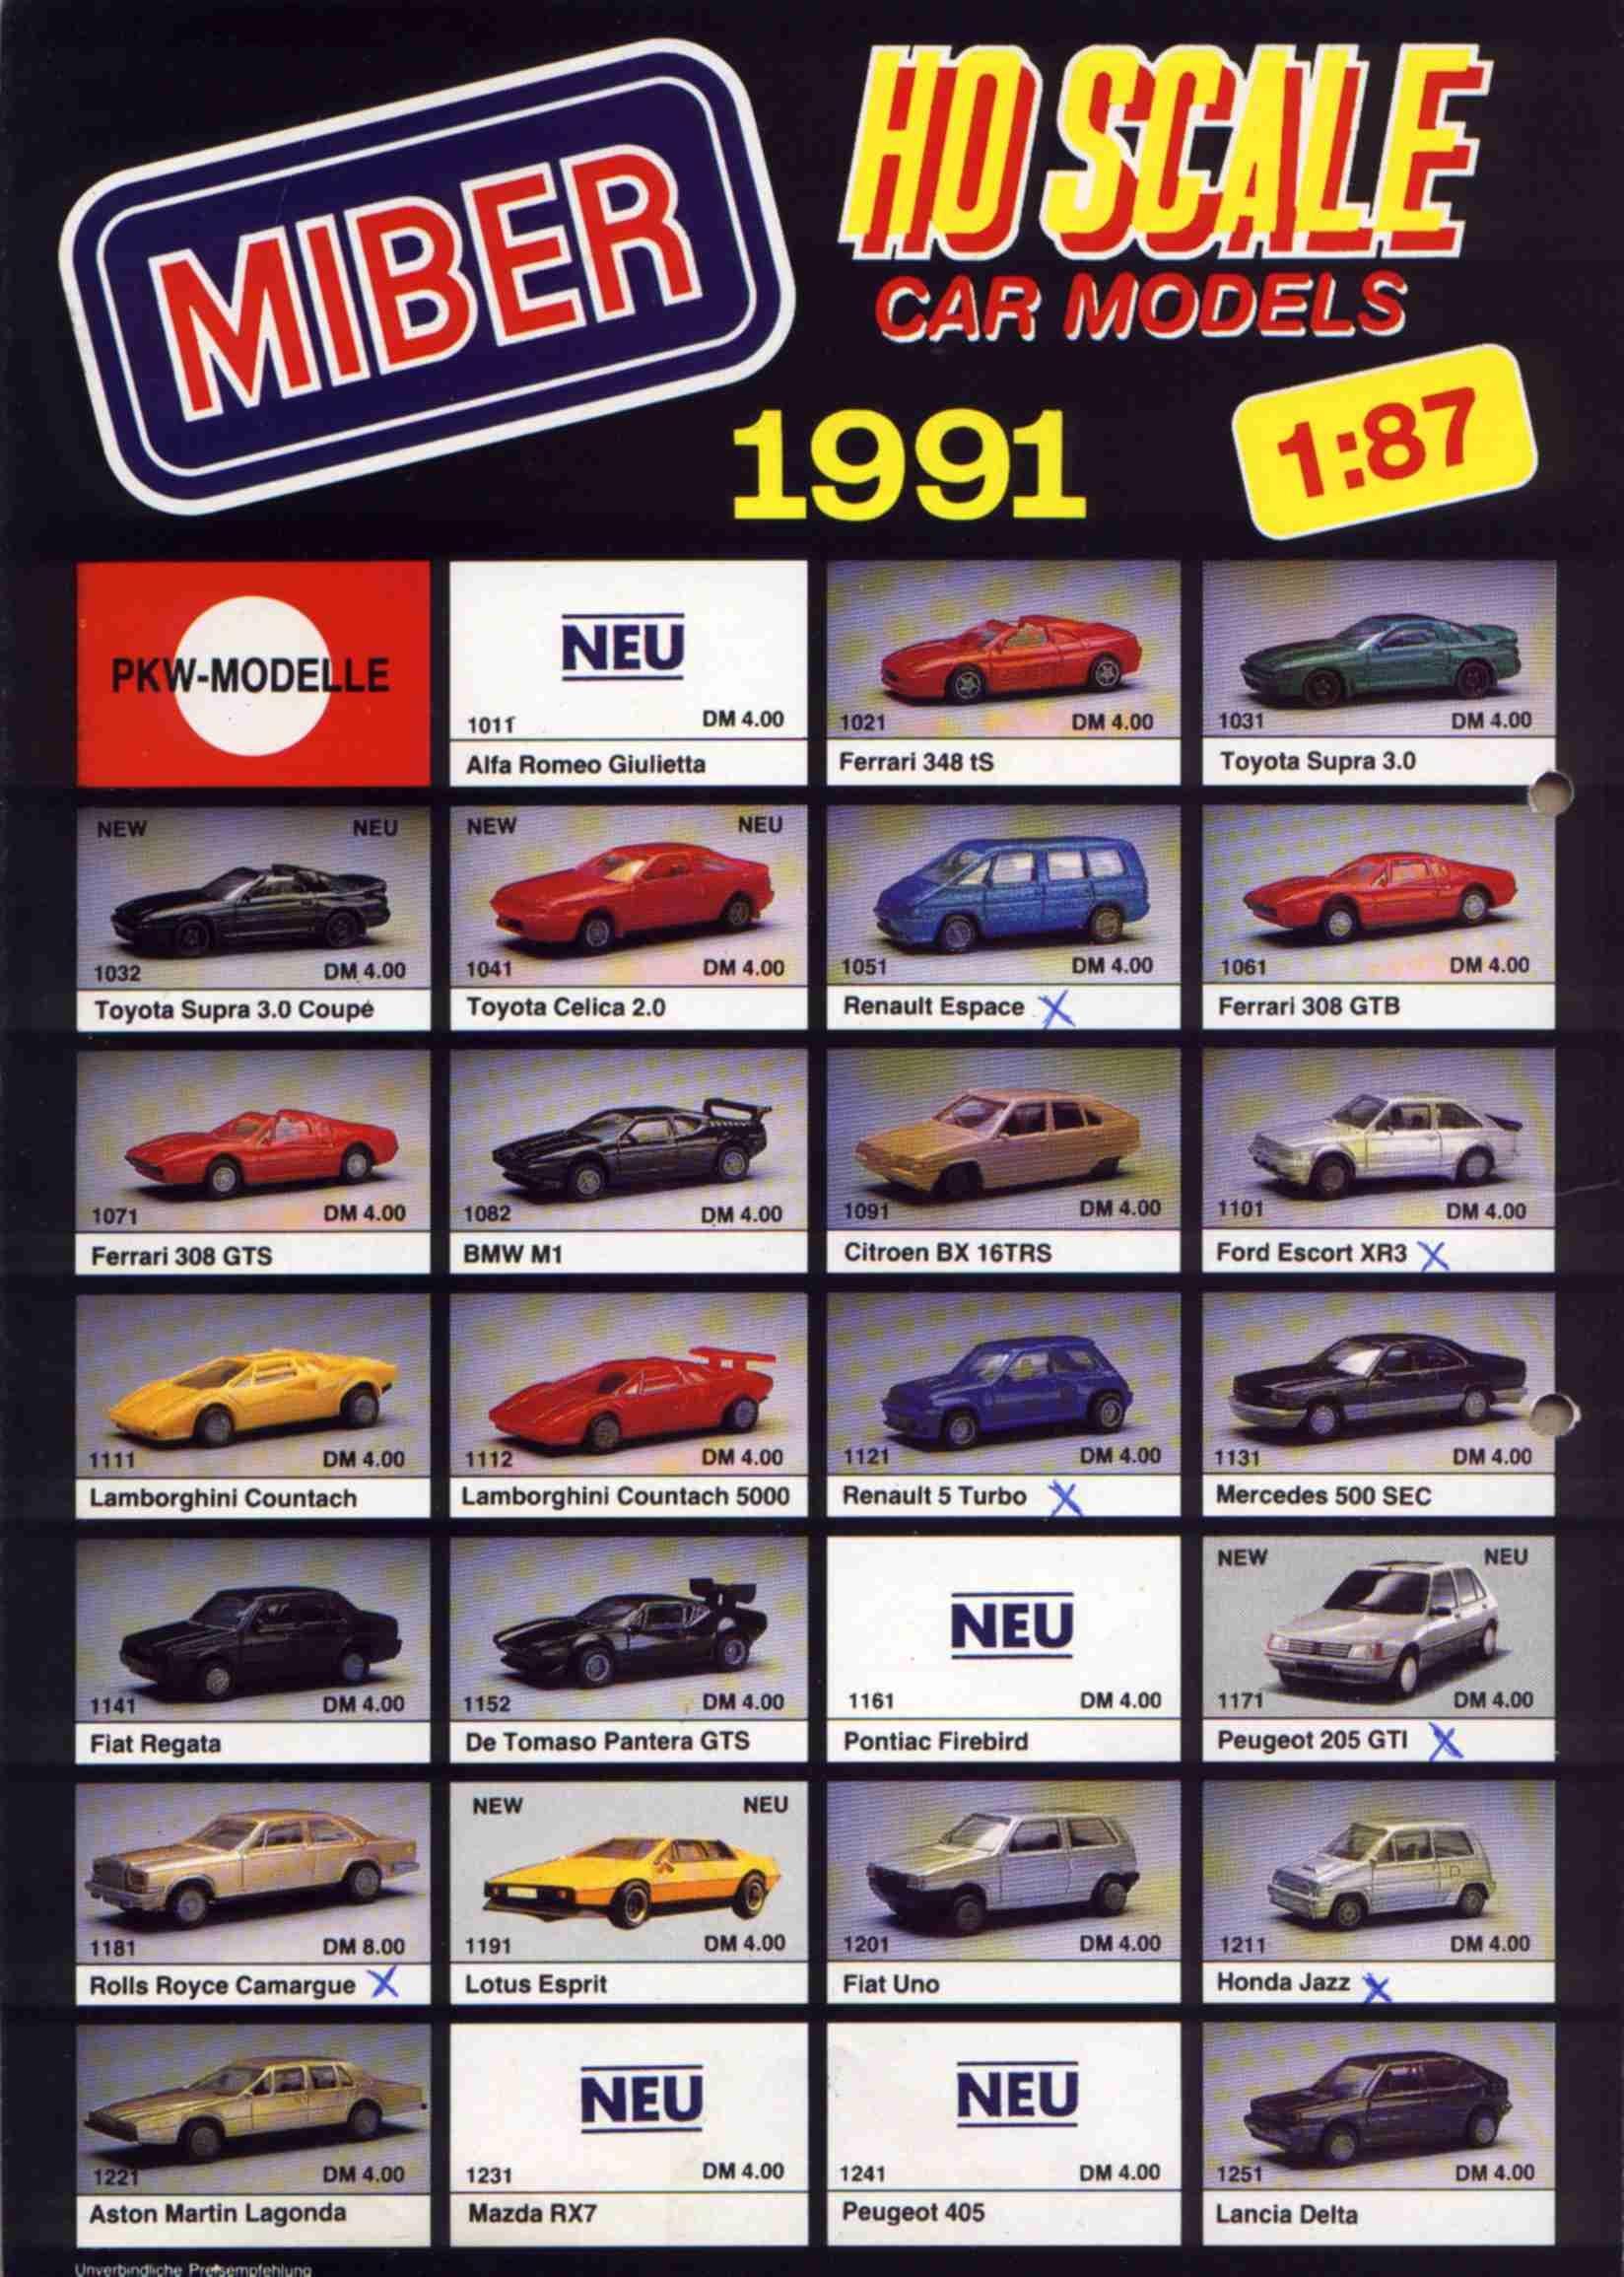 Audi Dealer Near Me >> Miber